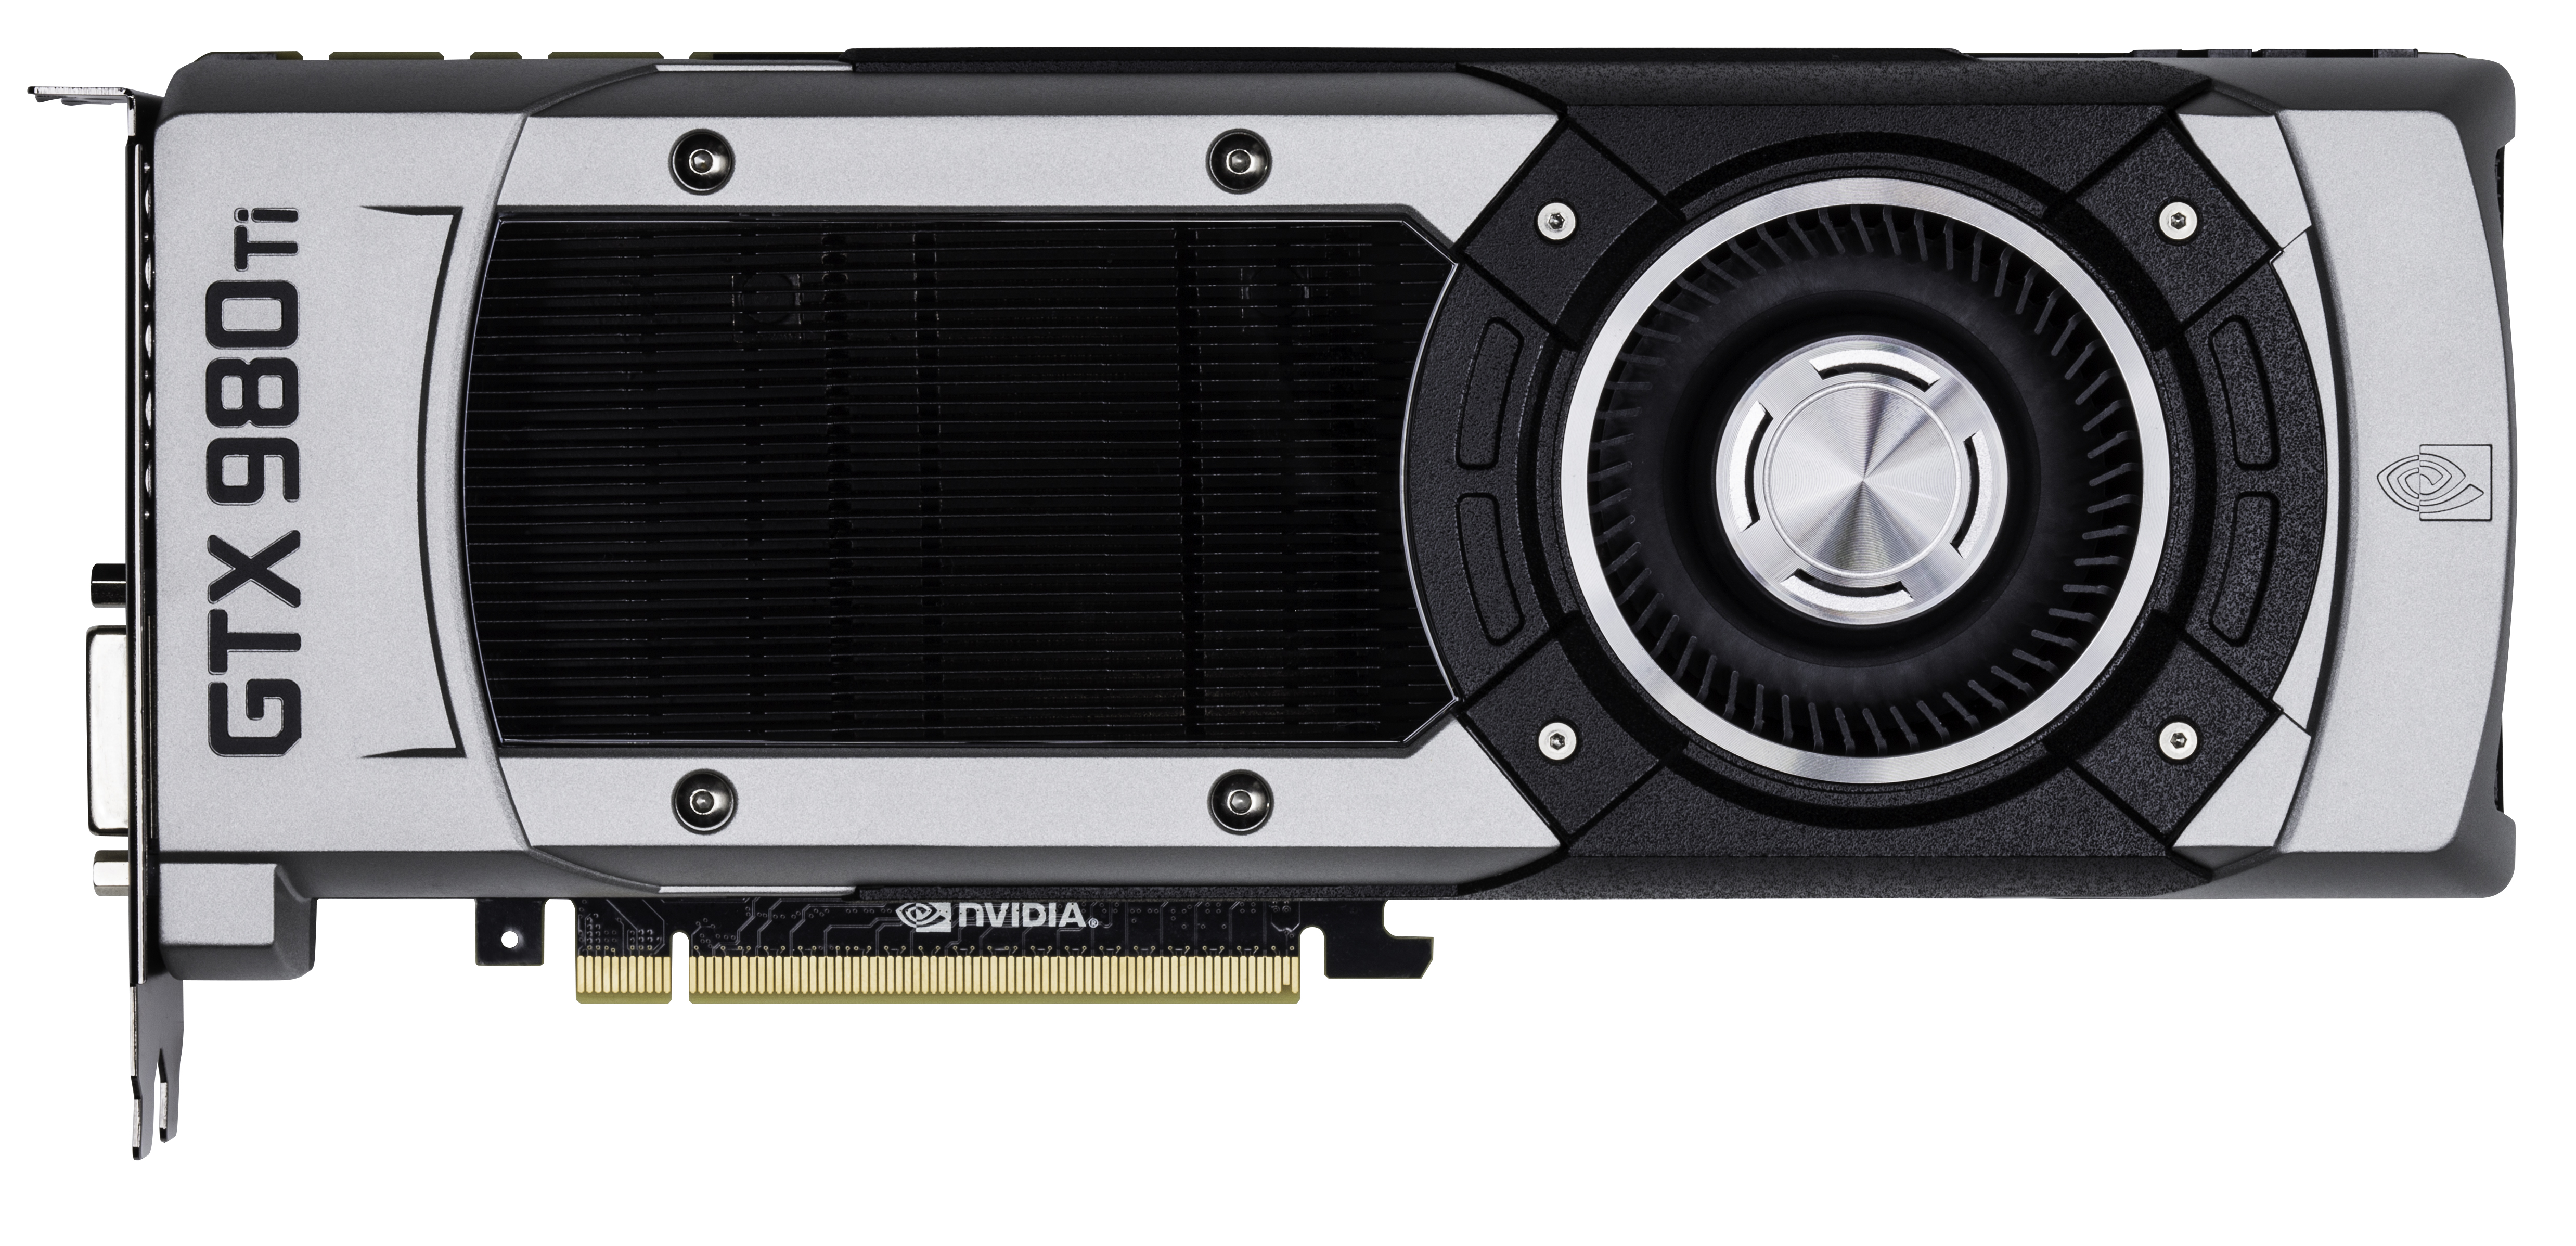 Meet The GeForce GTX 980 Ti - The NVIDIA GeForce GTX 980 Ti Review